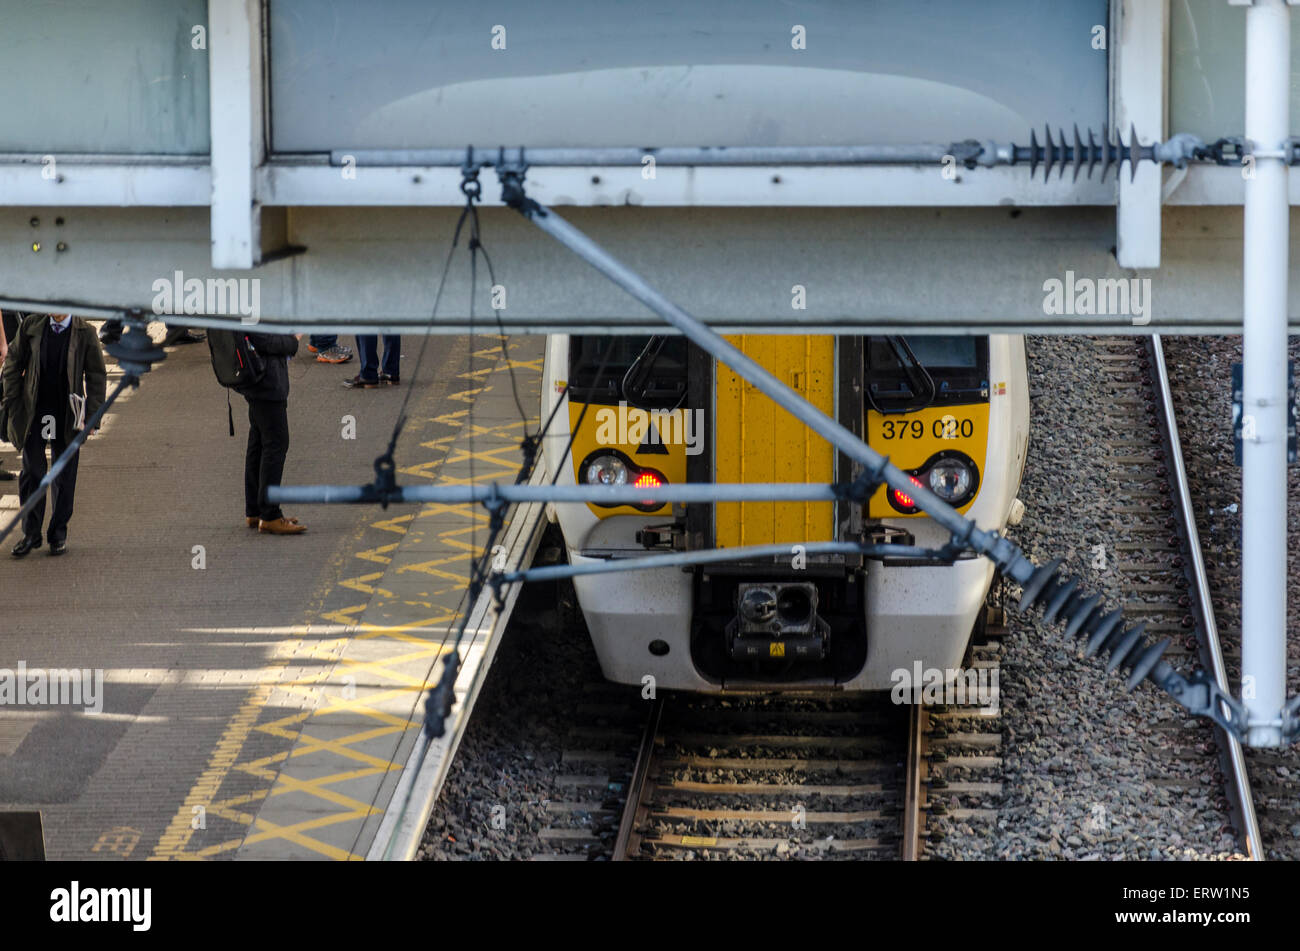 Train at Tottenham Hale station, London - Stock Image